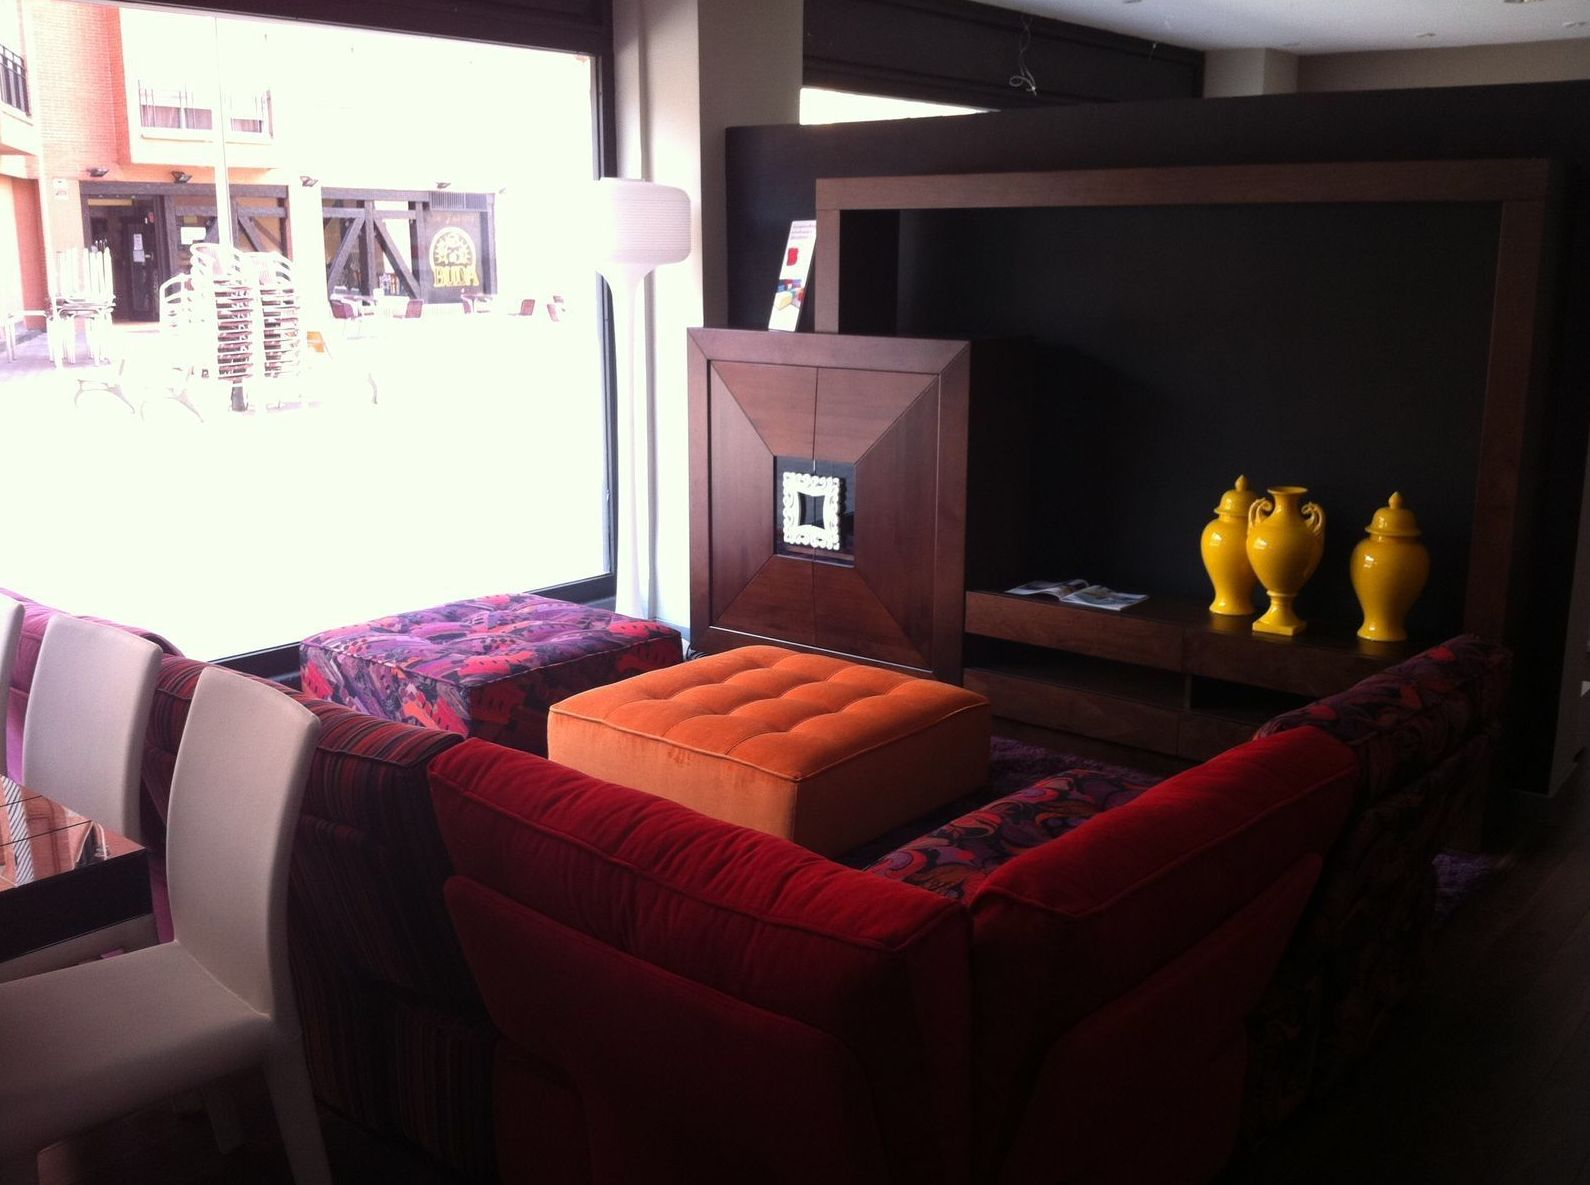 Foto 137 de Muebles en Getafe | Goga Muebles & Complementos